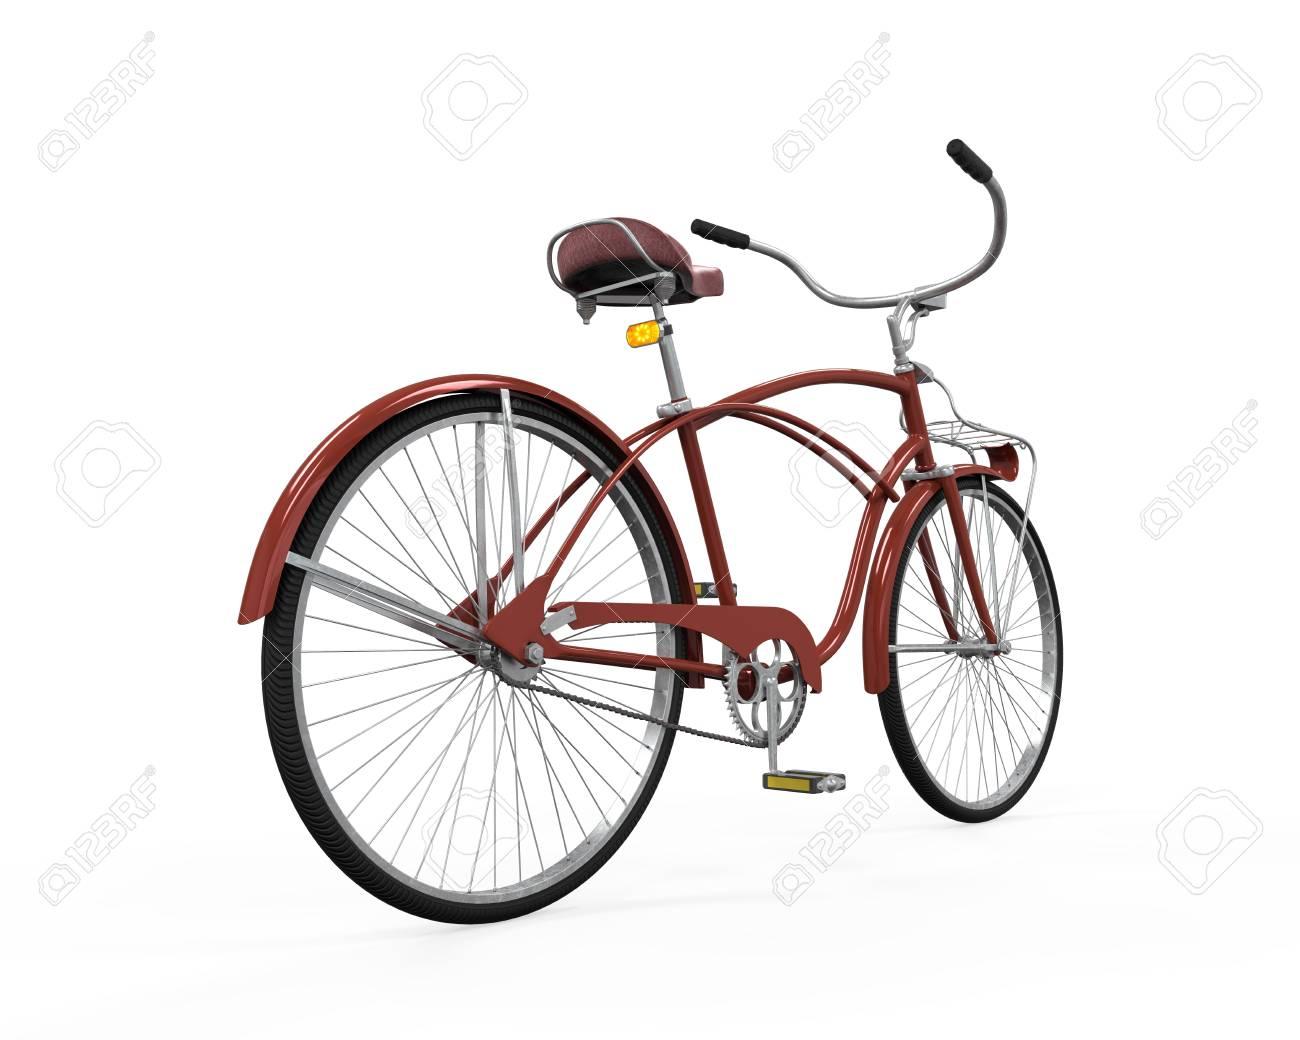 Vintage Bicycle Isolated Stock Photo - 21701006